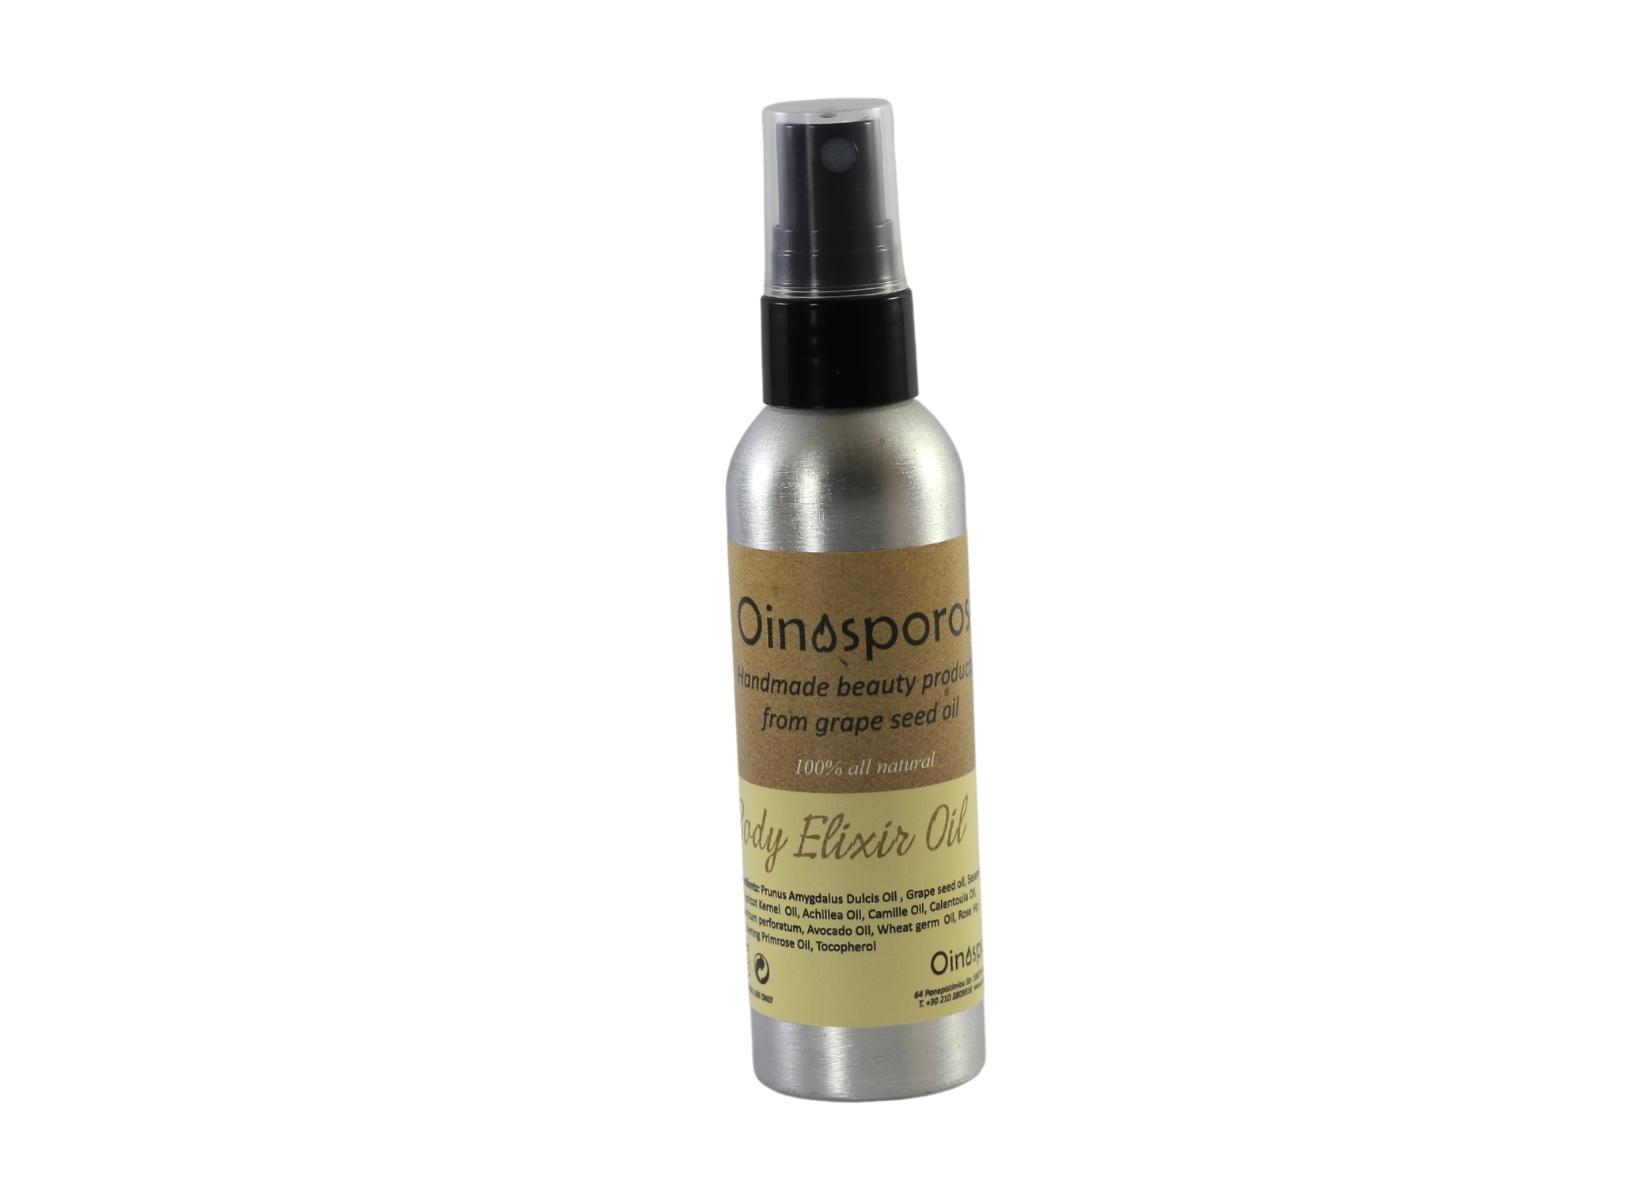 Oinosporos Body Elixir Oil